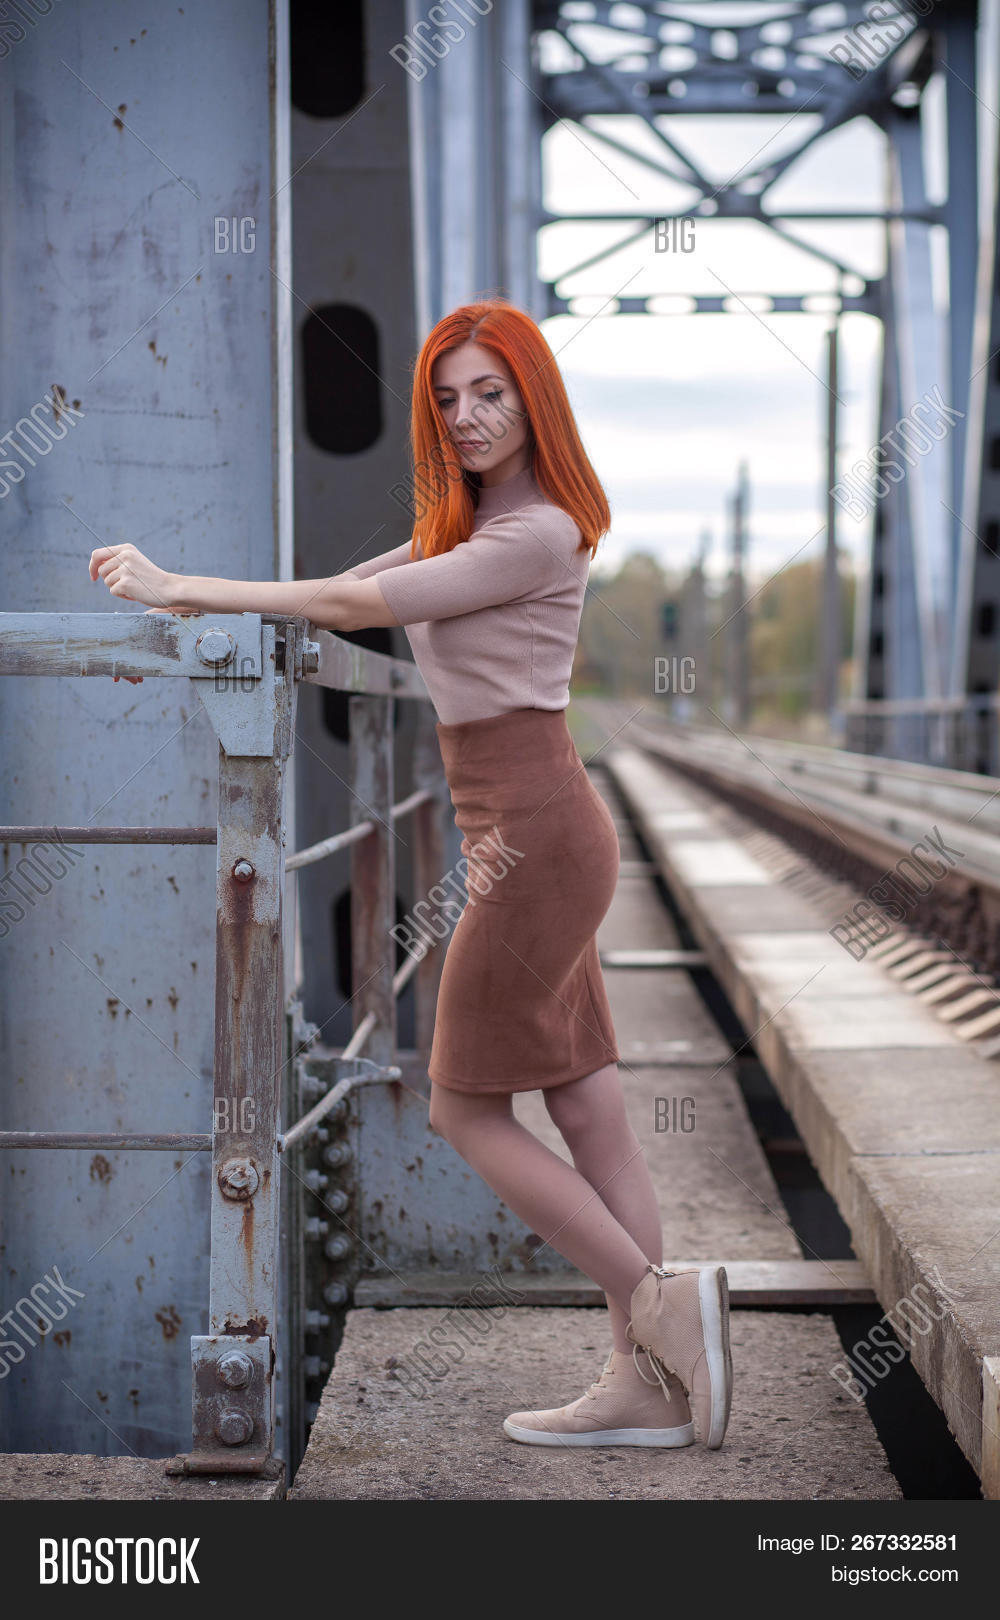 Cute Redhead Girl On Image Photo Free Trial Bigstock